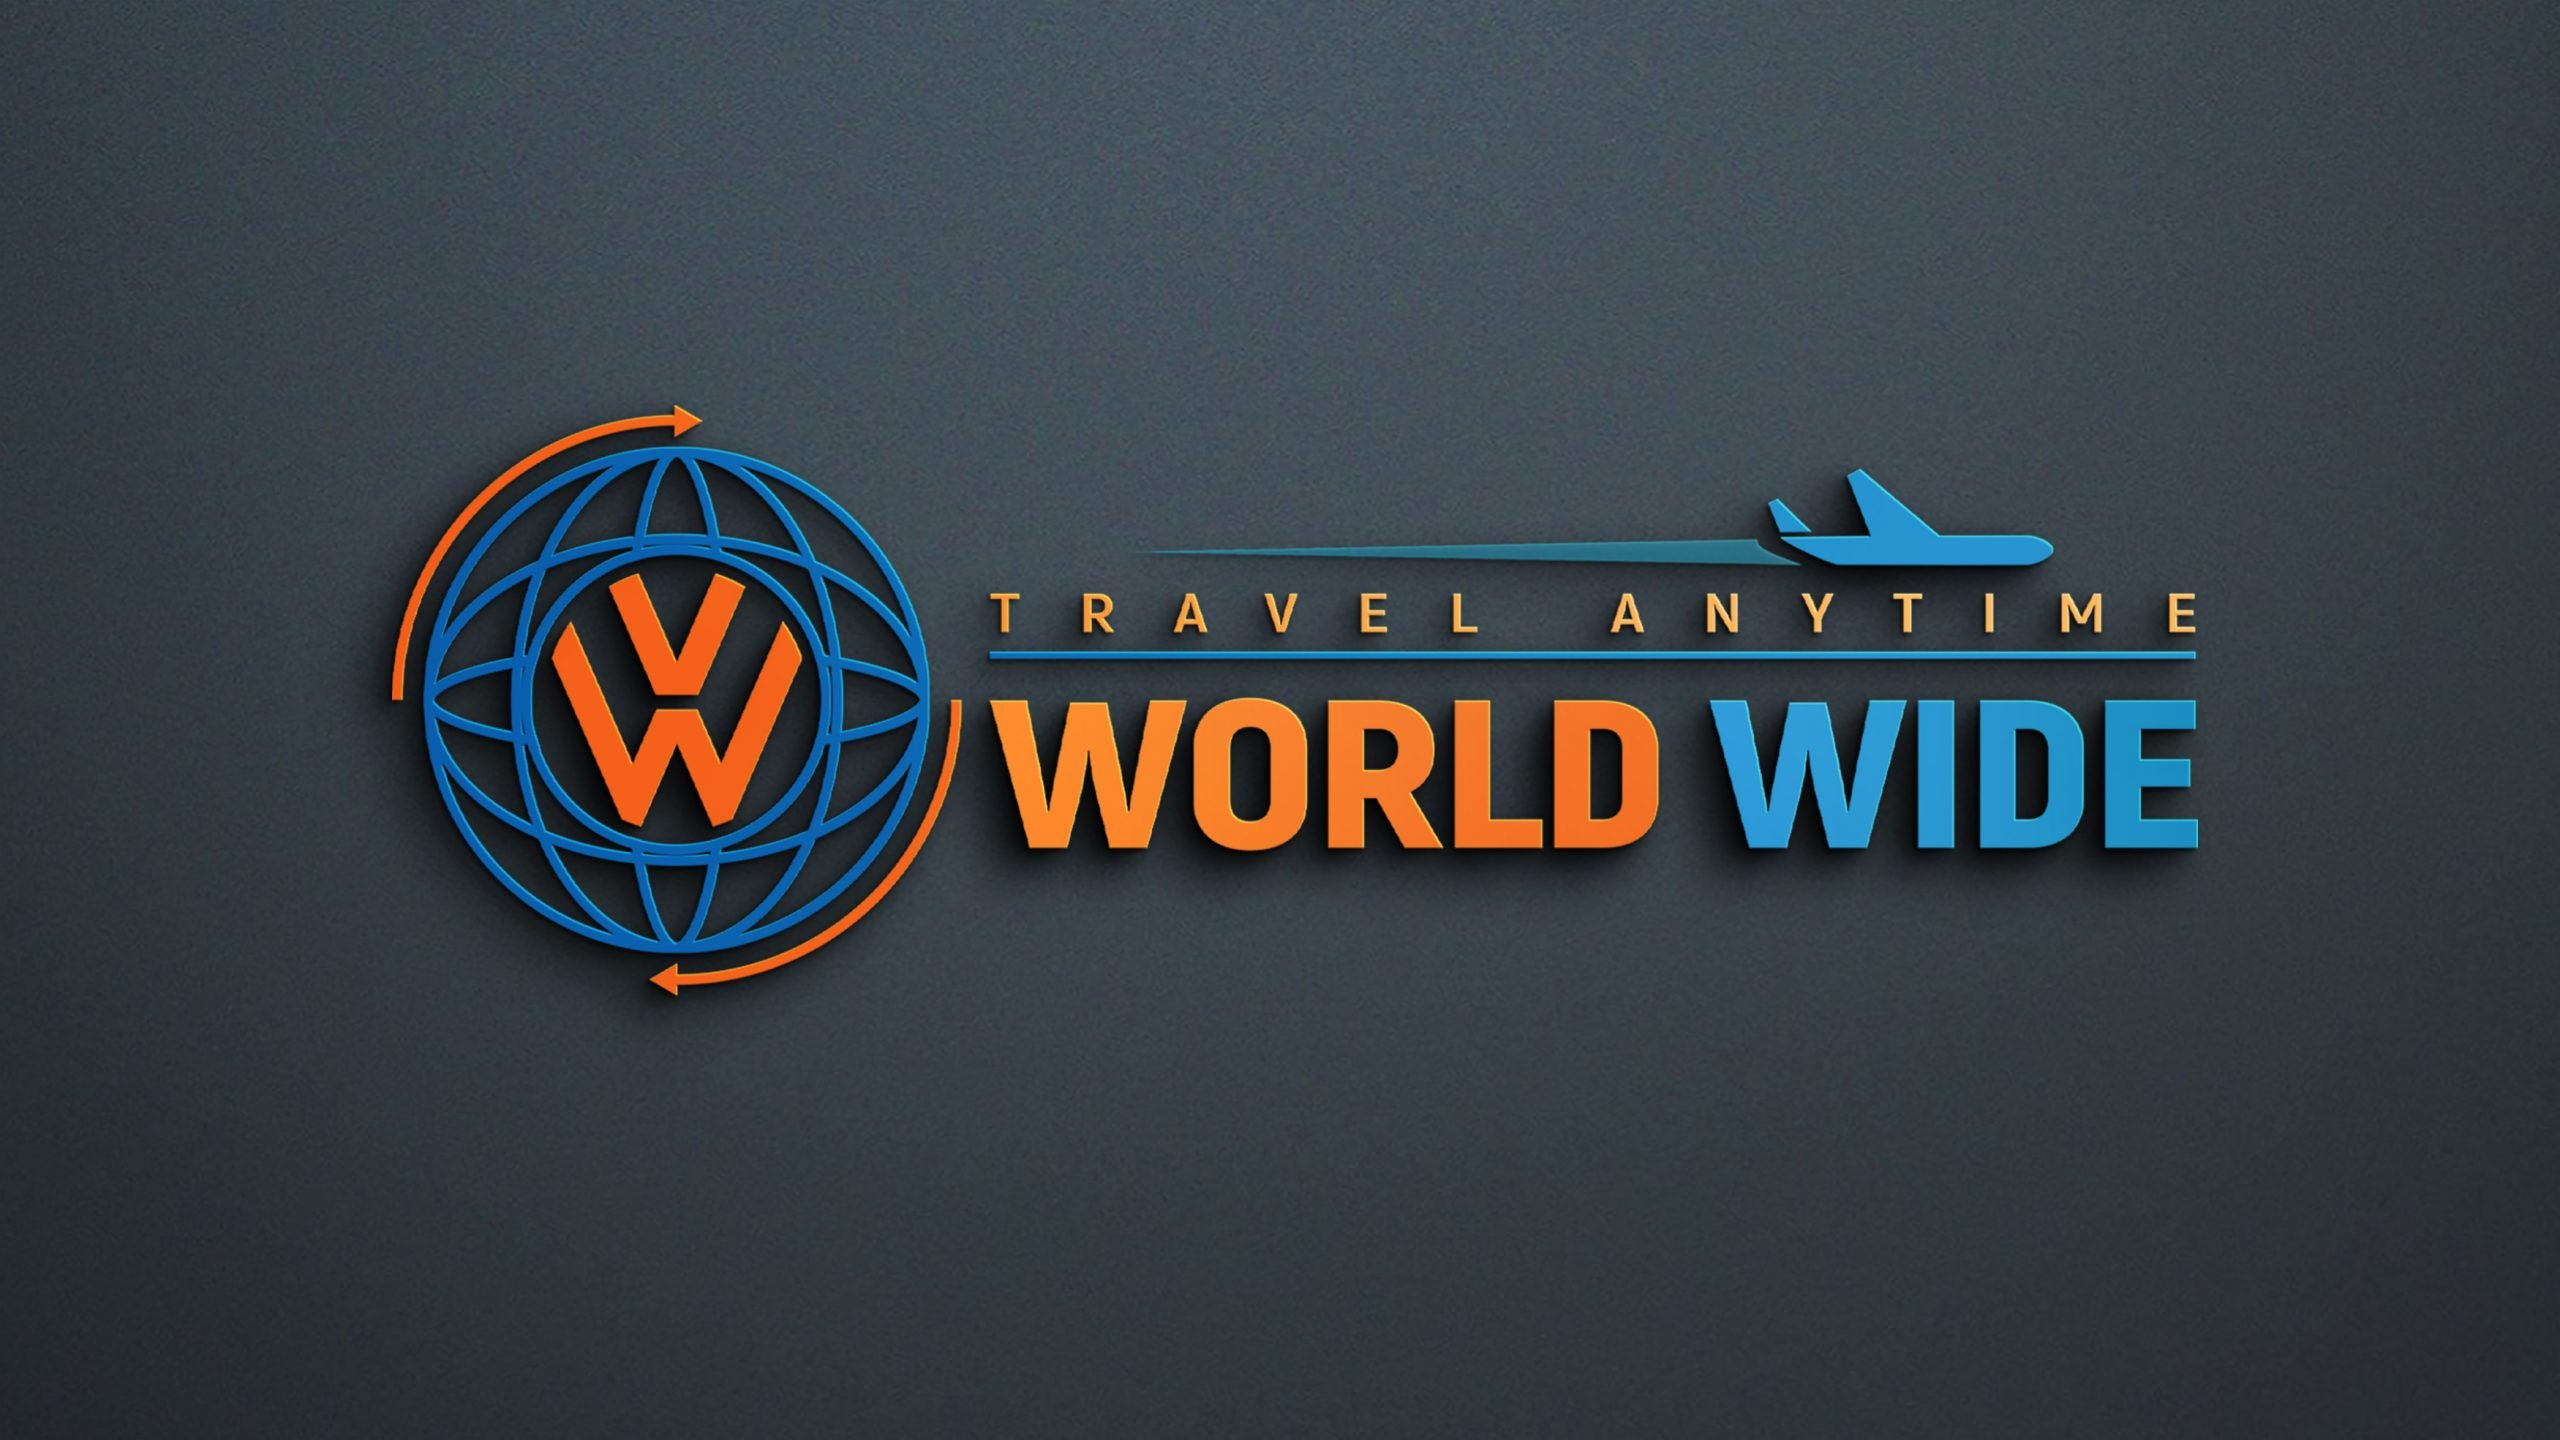 World Wide Travel Company Logo Design Download